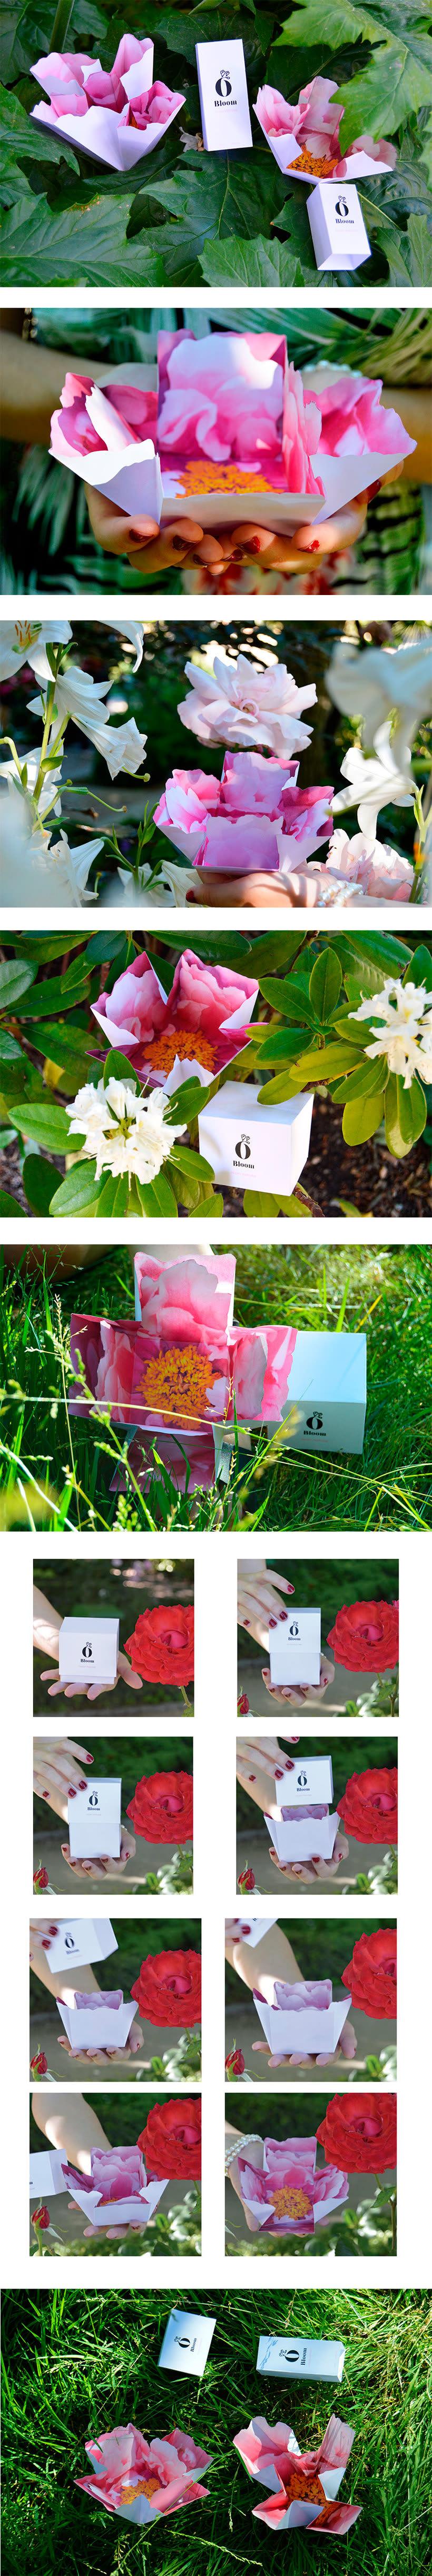 Bloom, perfume 5